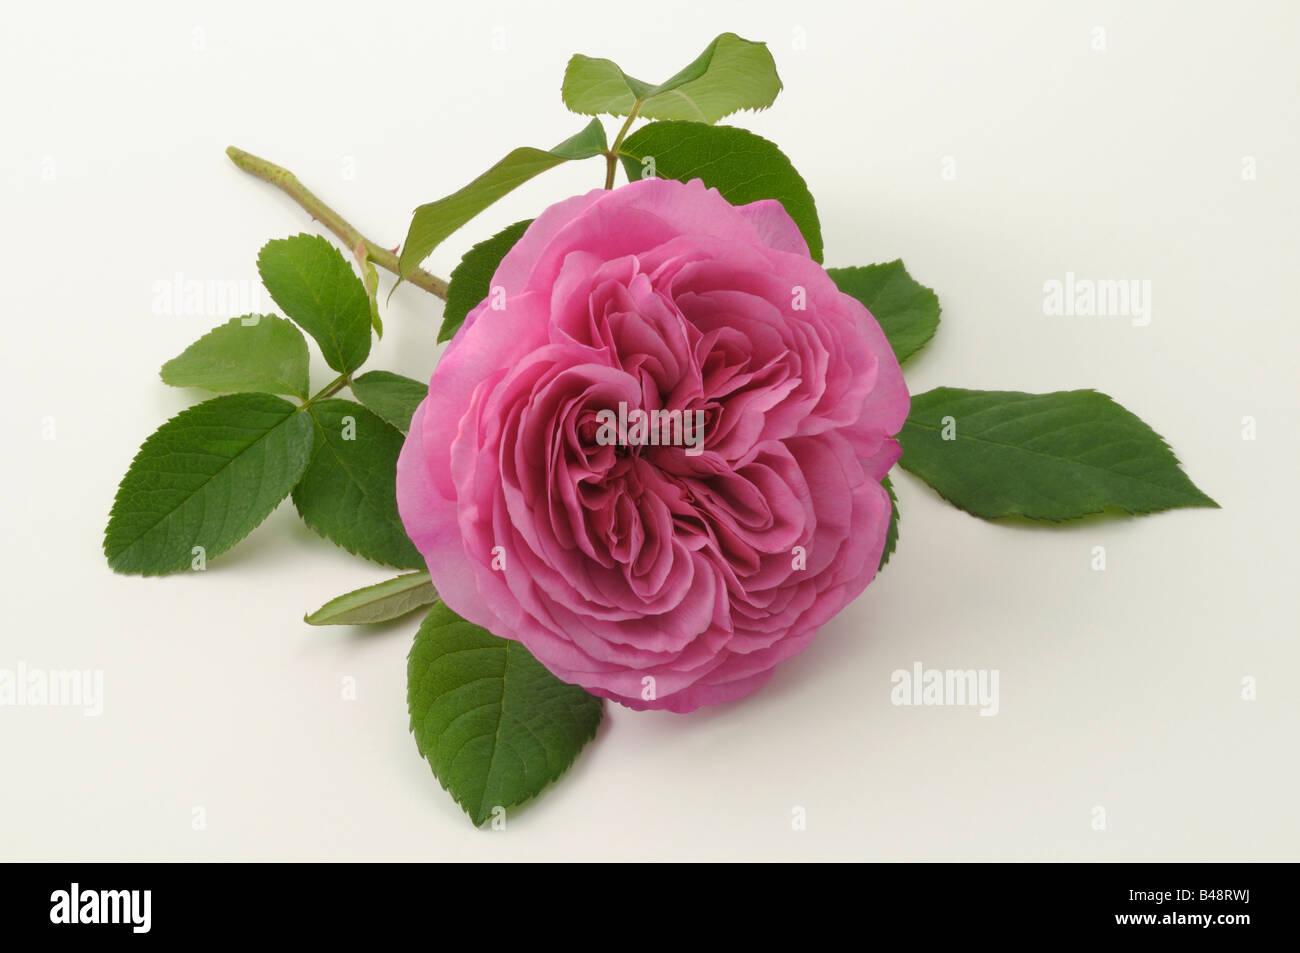 Damasco rosa (Rosa x damascena), varietà: Ispahan, fiore, studio immagine Immagini Stock